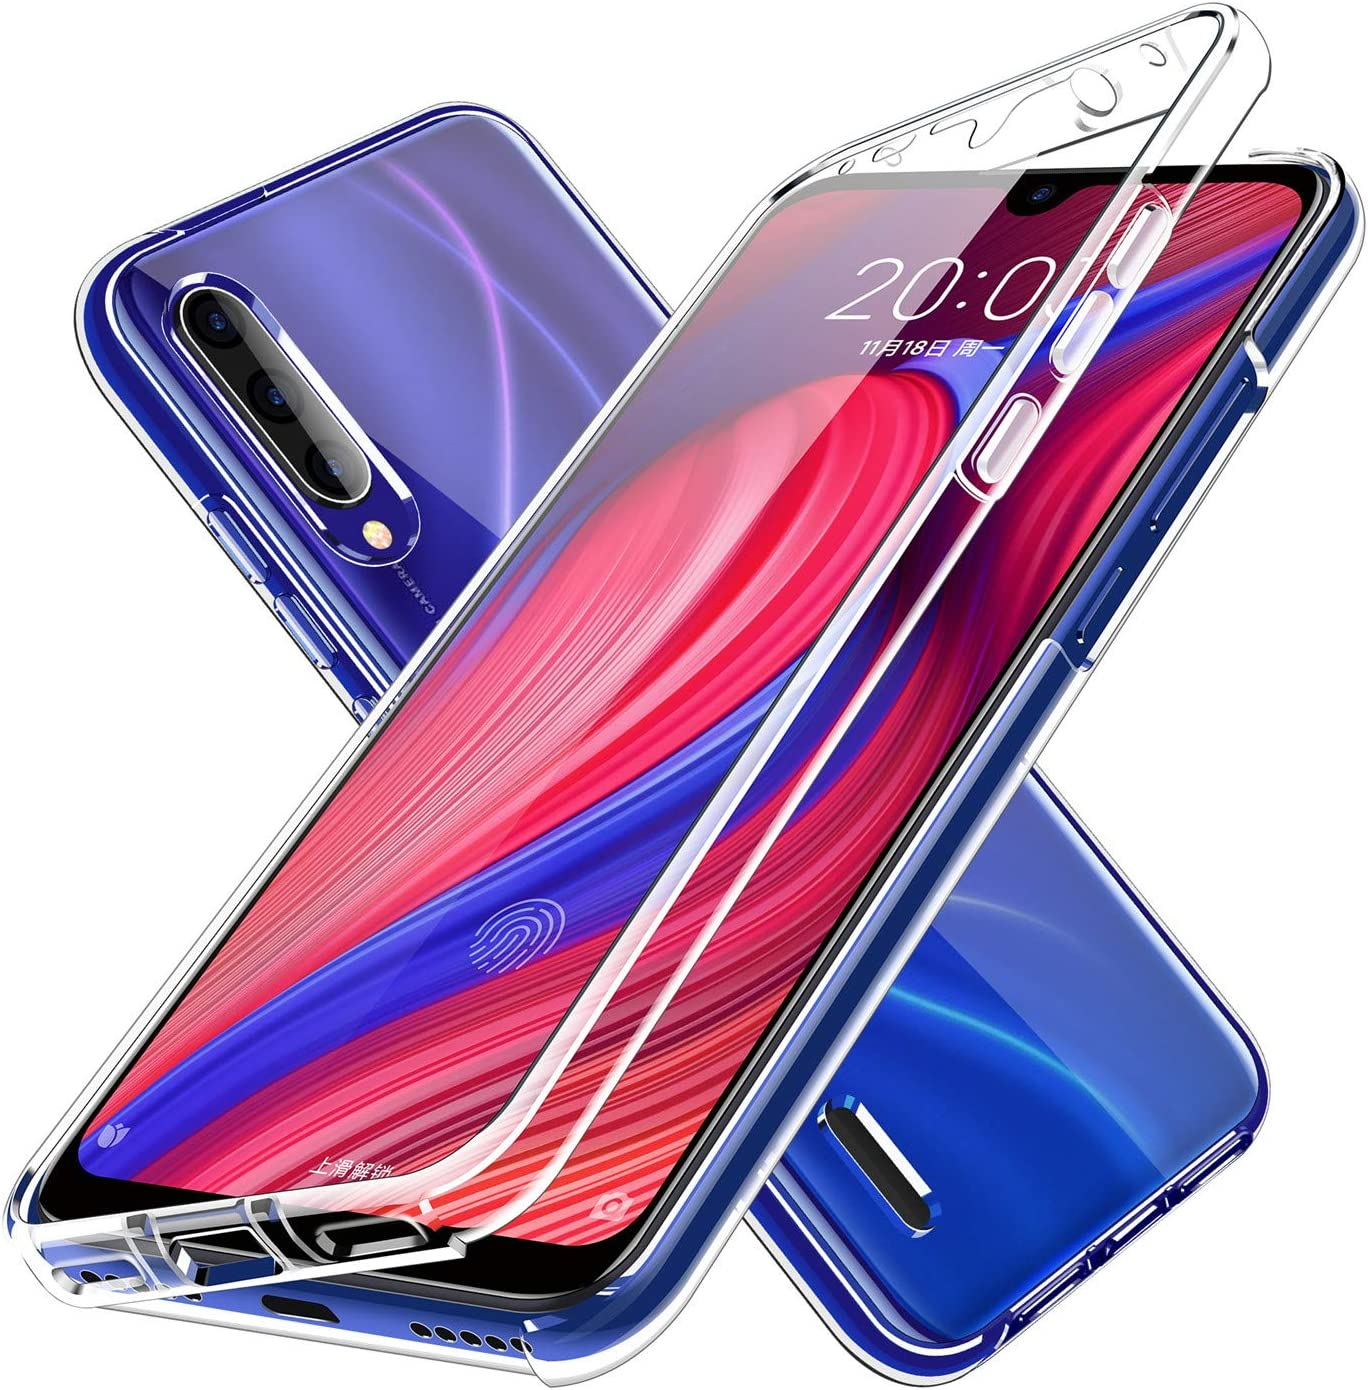 Funda para Xiaomi Mi A2 Lite - Carcasa Completa Anti-Shock [360°] Full Body Protección [Silicona TPU Frente] y [Duro PC Back] para Xiaomi Mi A2 Lite - Cover Doble [Transparente]